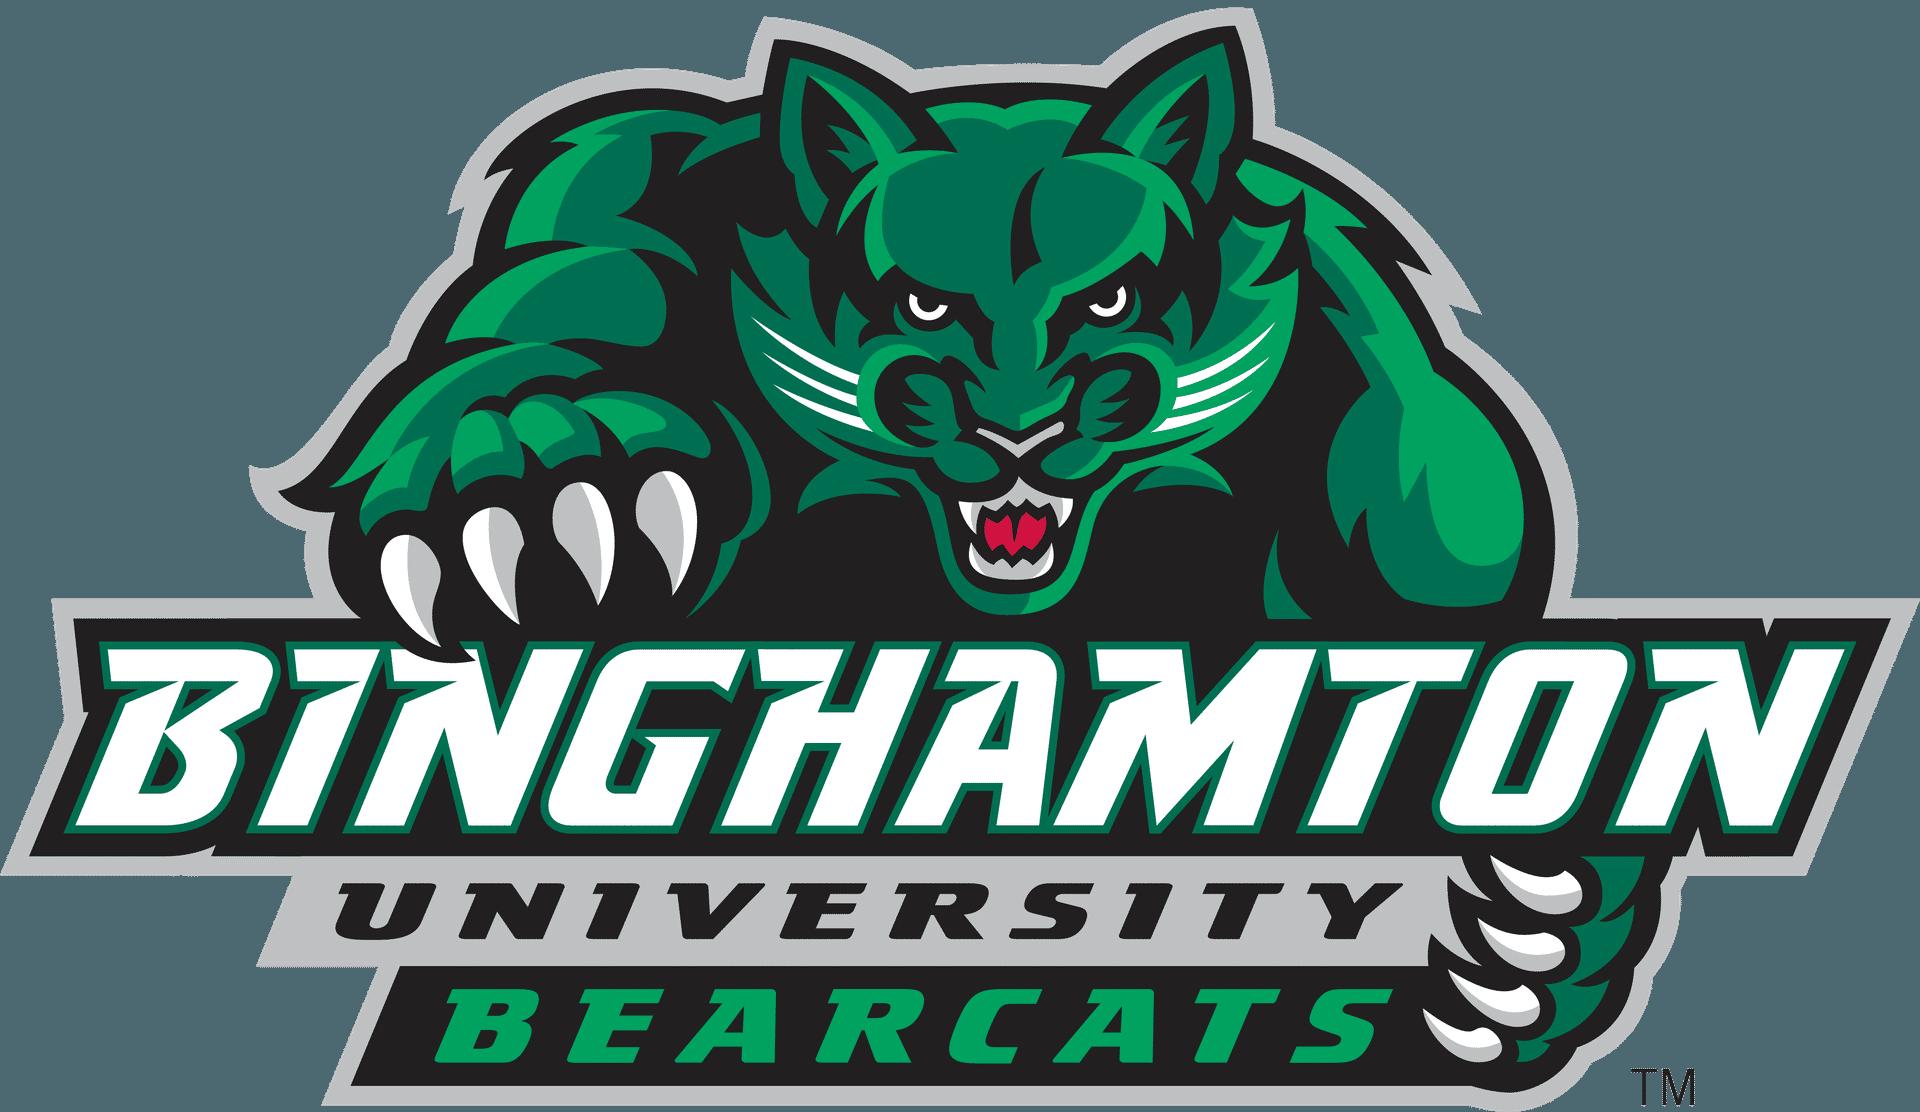 Binghampton University